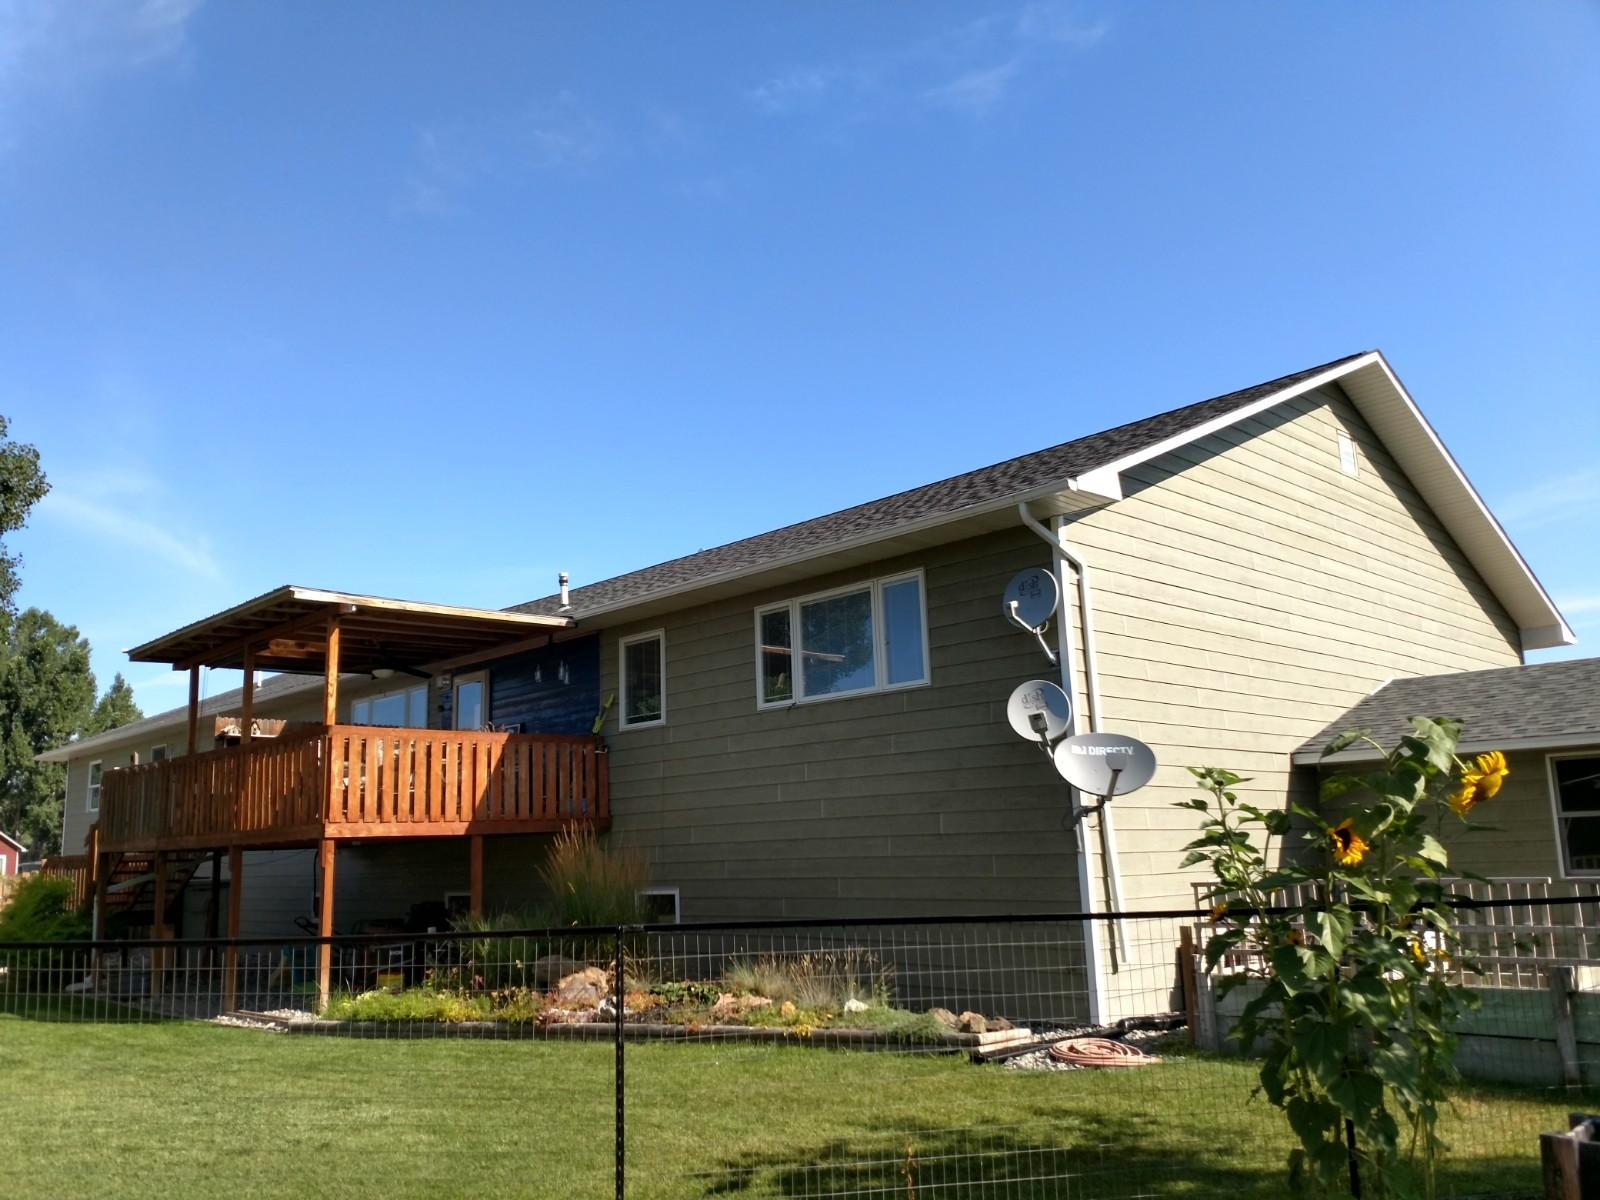 103 Carl Street, Ranchester, Wyoming 82839, 3 Bedrooms Bedrooms, ,2 BathroomsBathrooms,Residential,For Sale,Carl,18-864